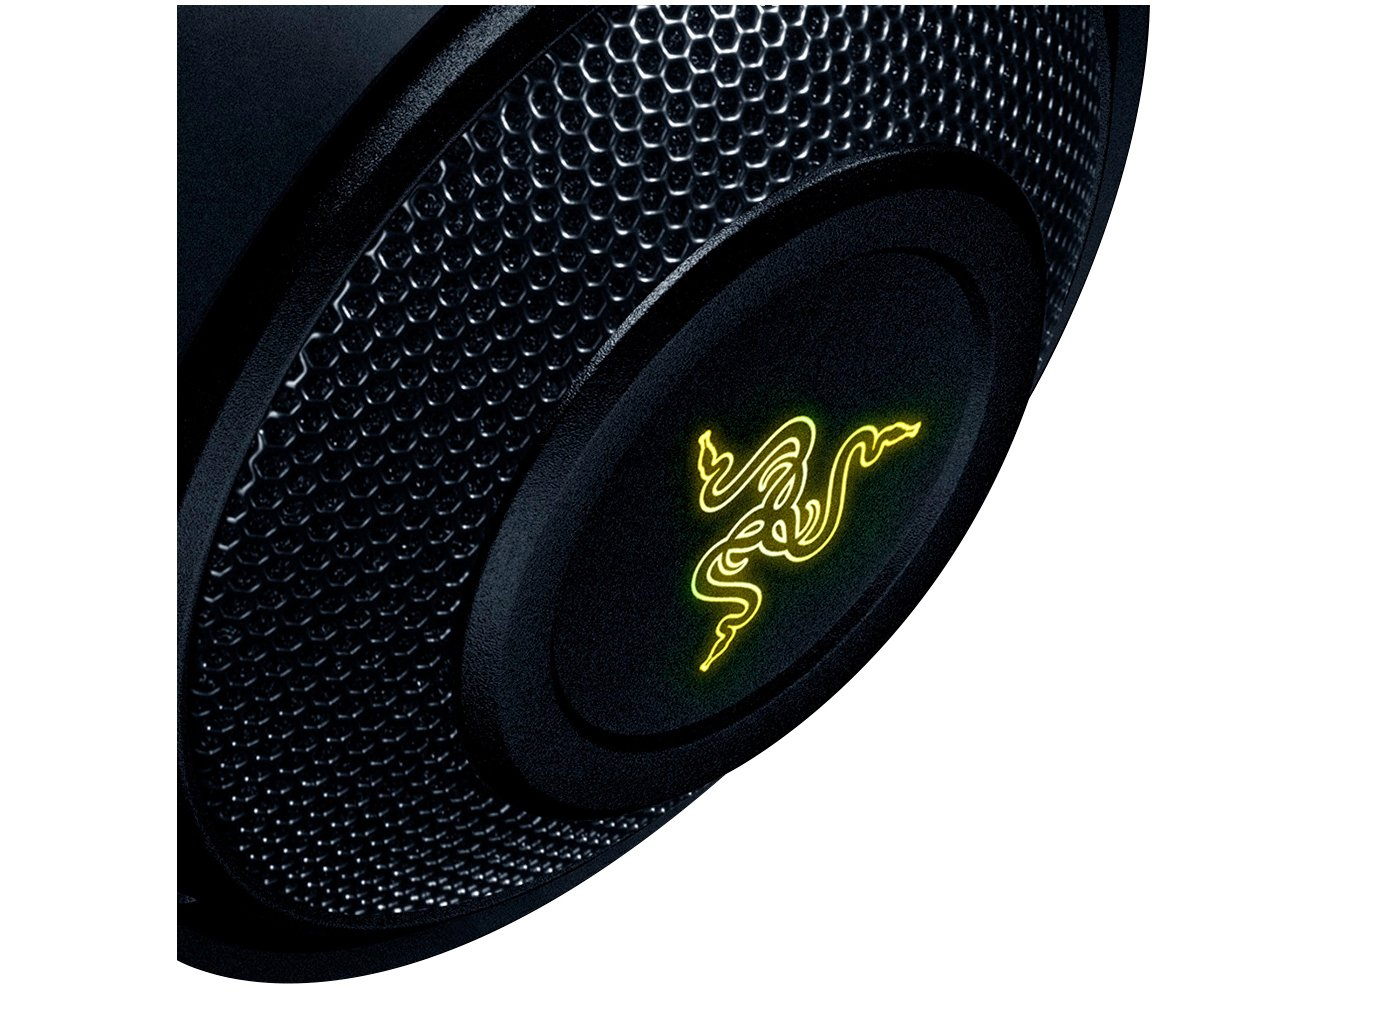 Foto 5 - Headset Gamer para PC Mac PS4 Razer - Kraken 7.1 V2 Chroma Mic